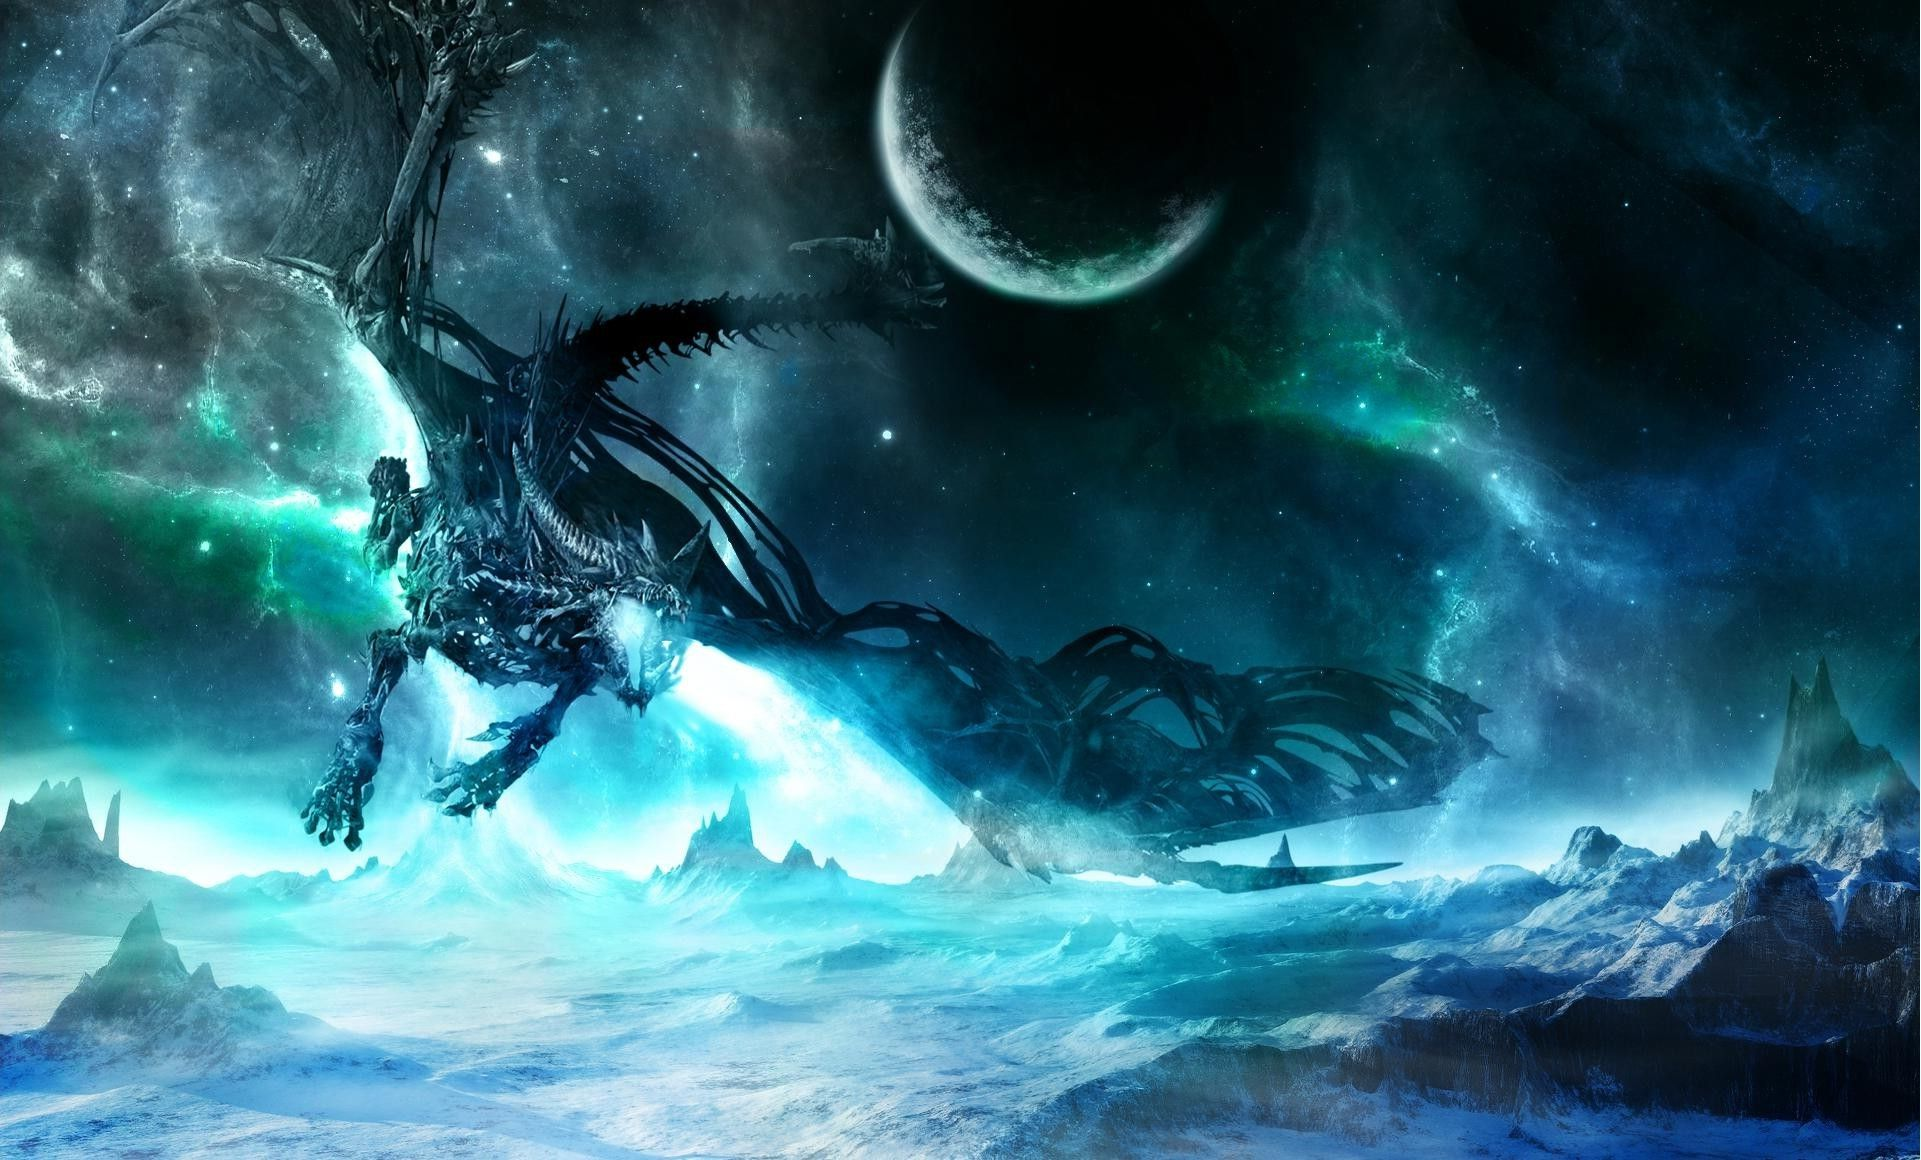 Dragon Desktop Wallpapers Top Free Dragon Desktop Backgrounds